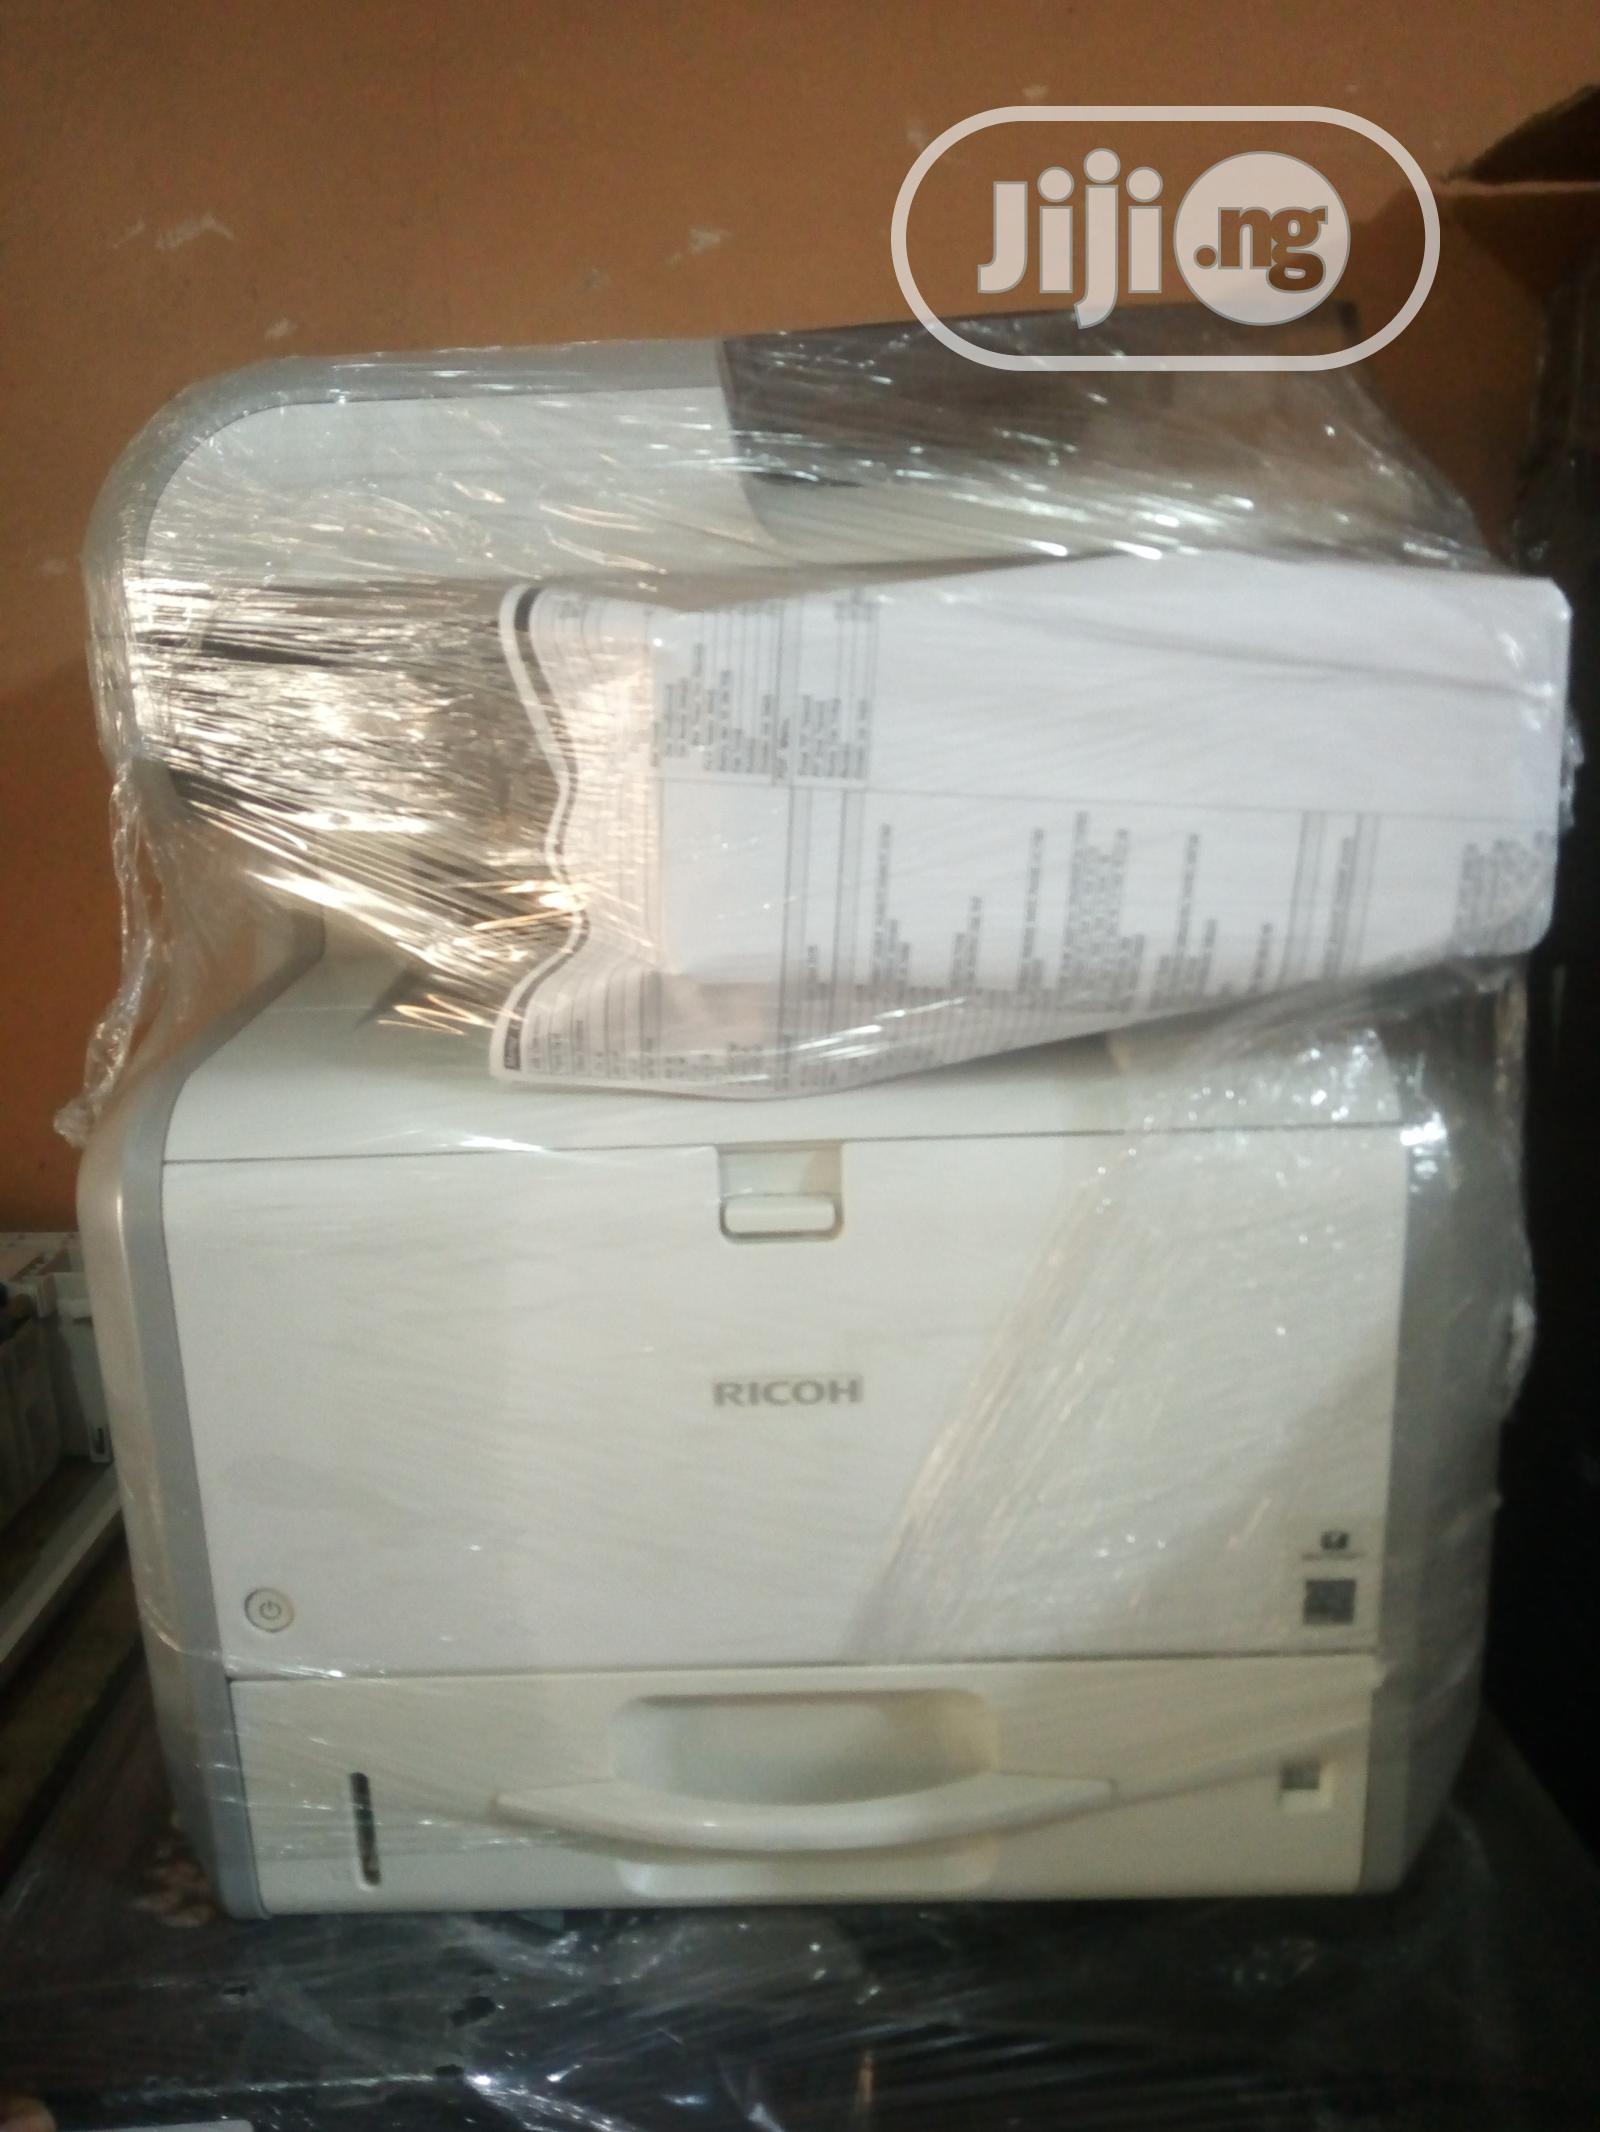 Aficio Ricoh Sp4510sf Multifunctional Black and White